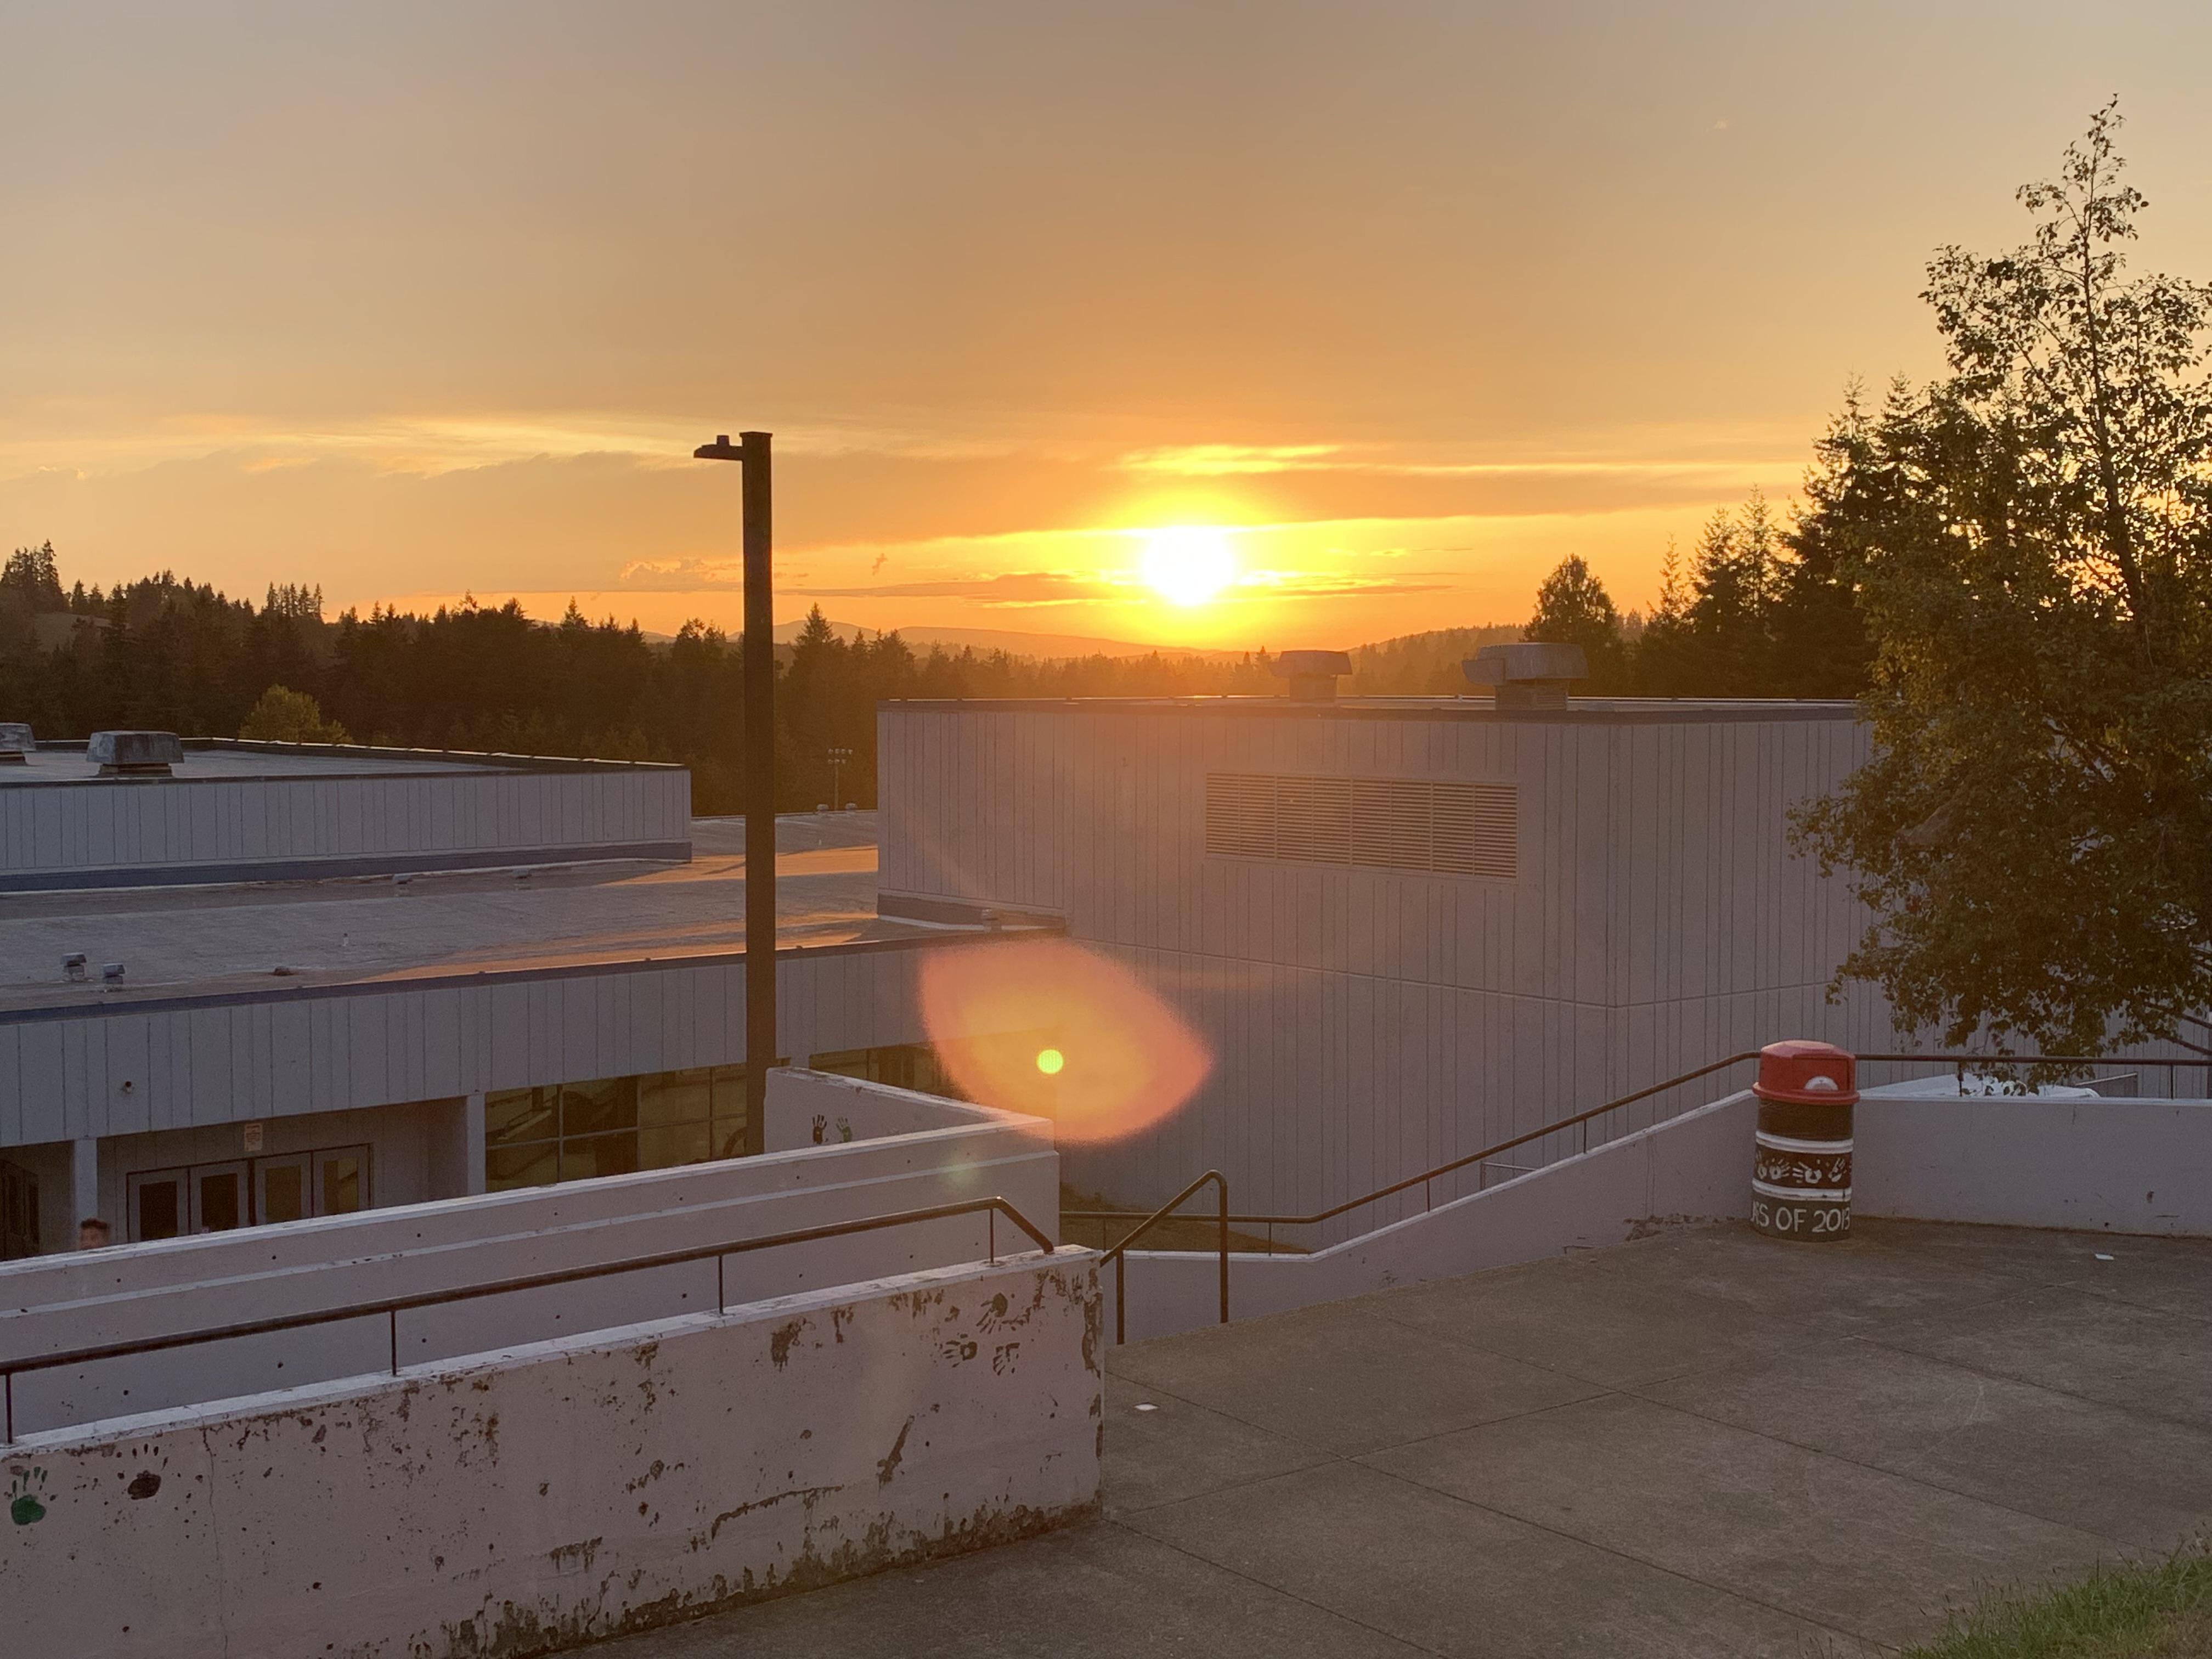 Junior High Sunset